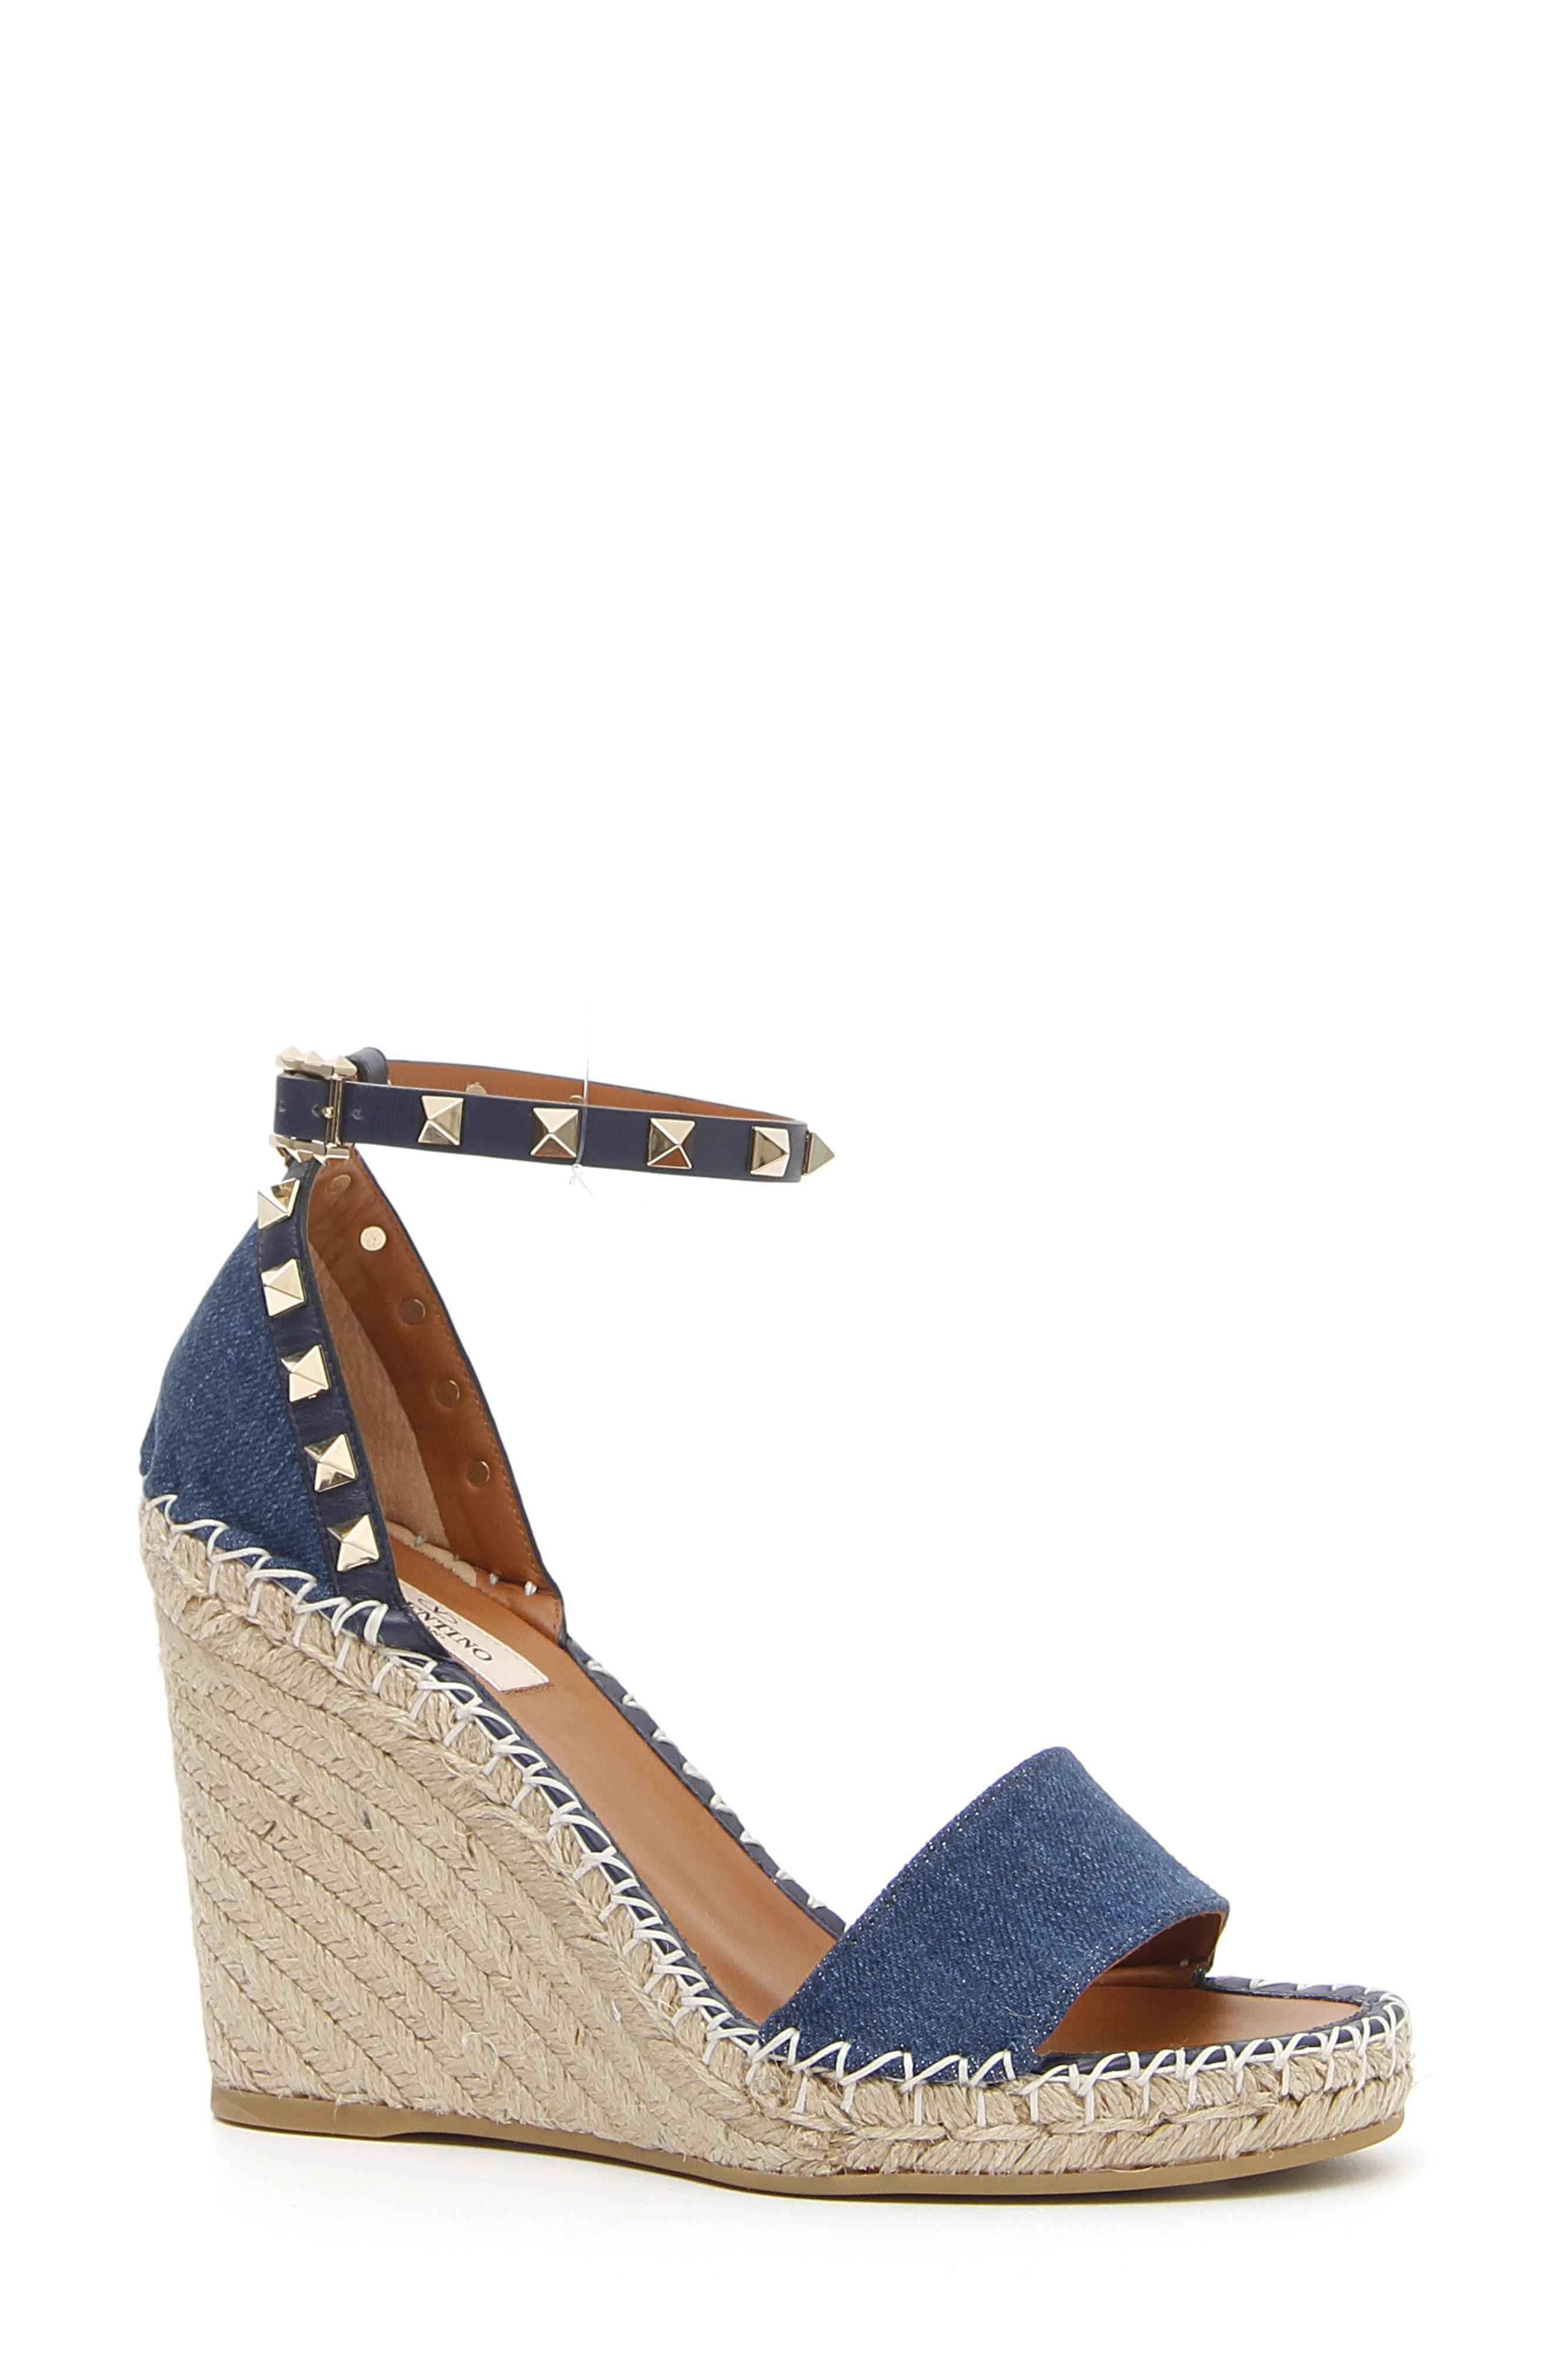 dffa6b5c6ce Lyst - Valentino Women's Rockstud Denim Espadrille Wedge Sandals ...